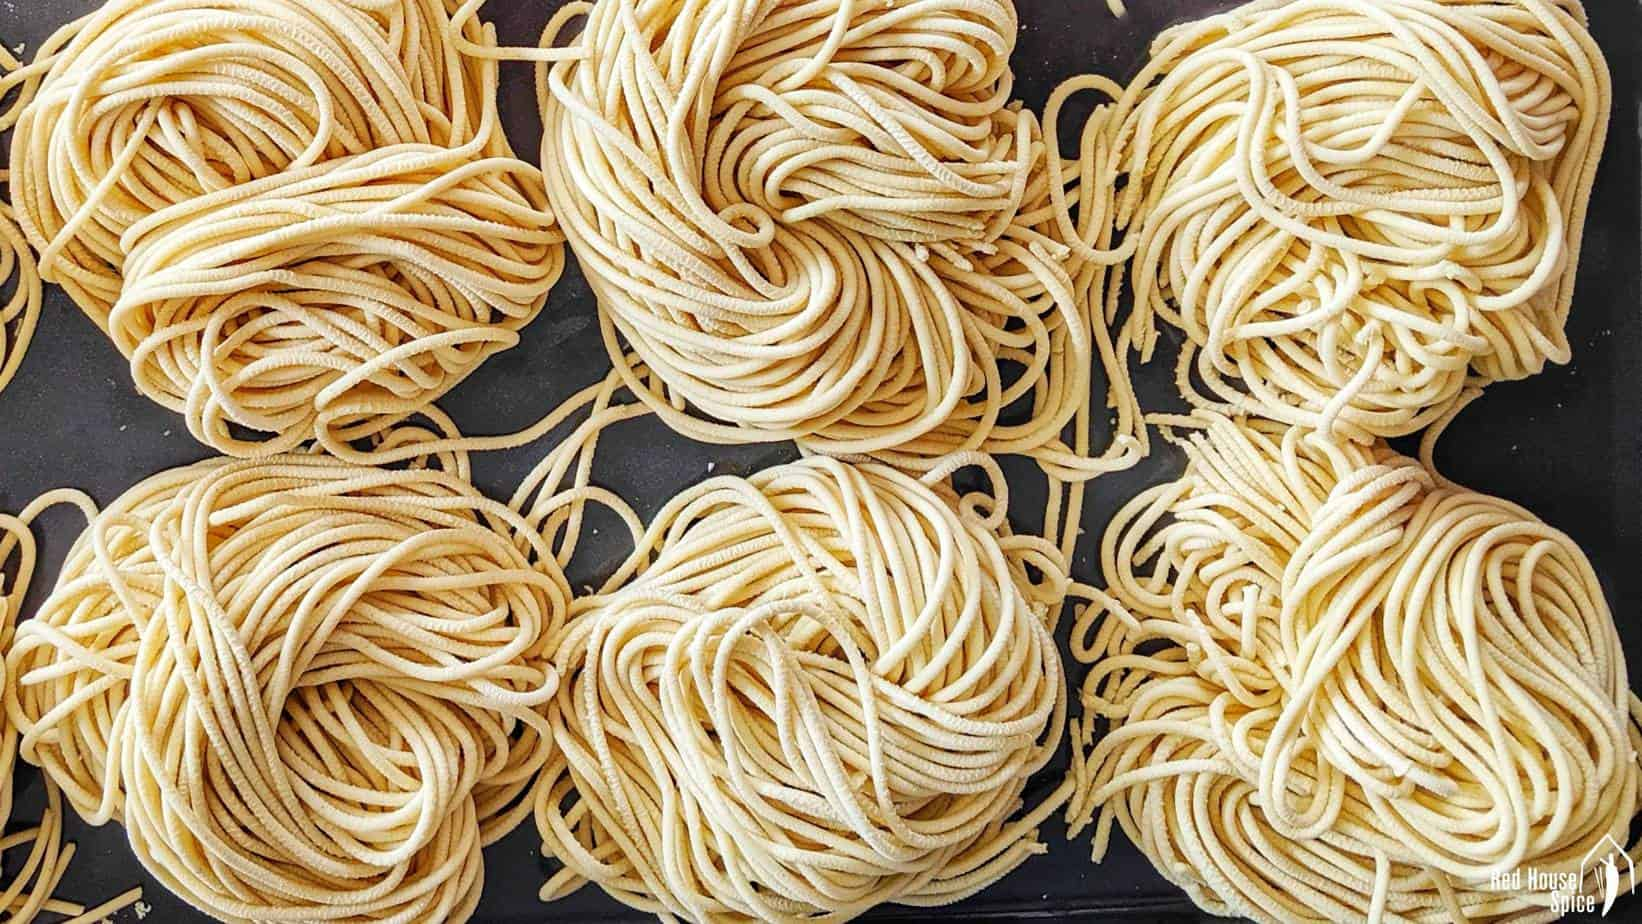 Six rolls of fresh alkaline noodles.